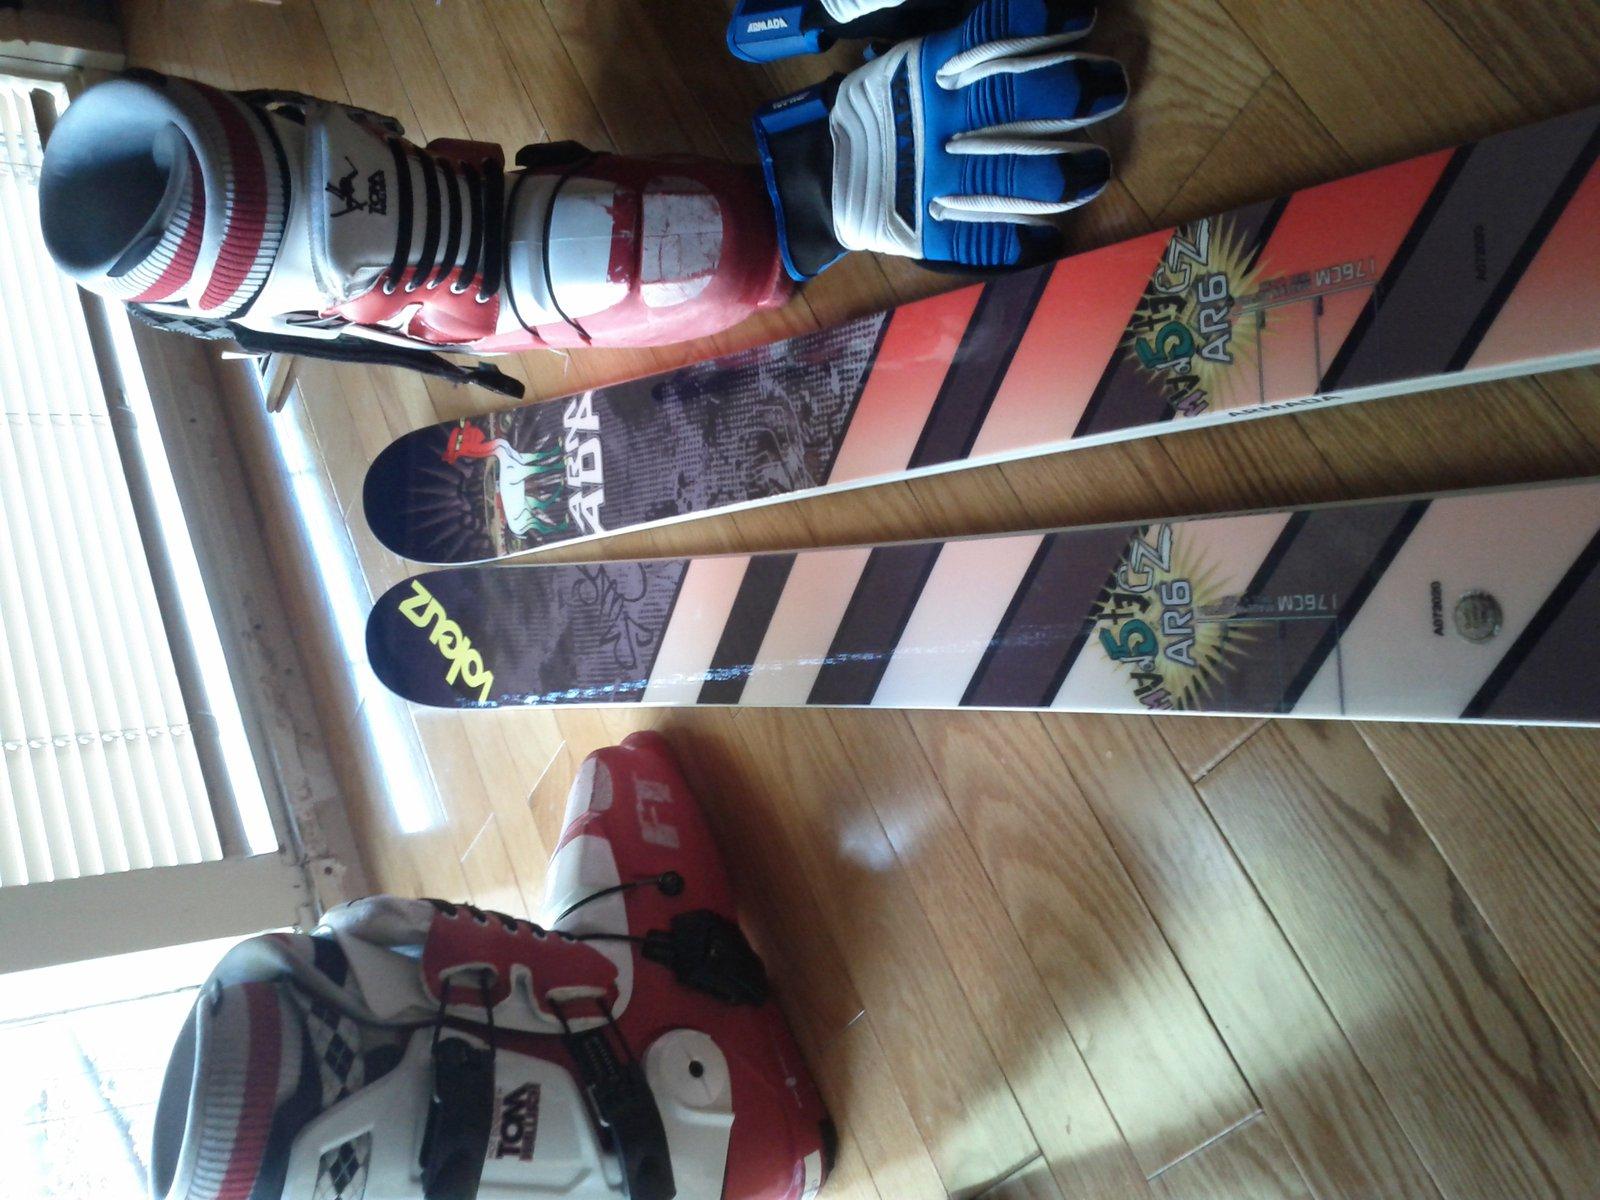 new ski stuff for 2012 season so far